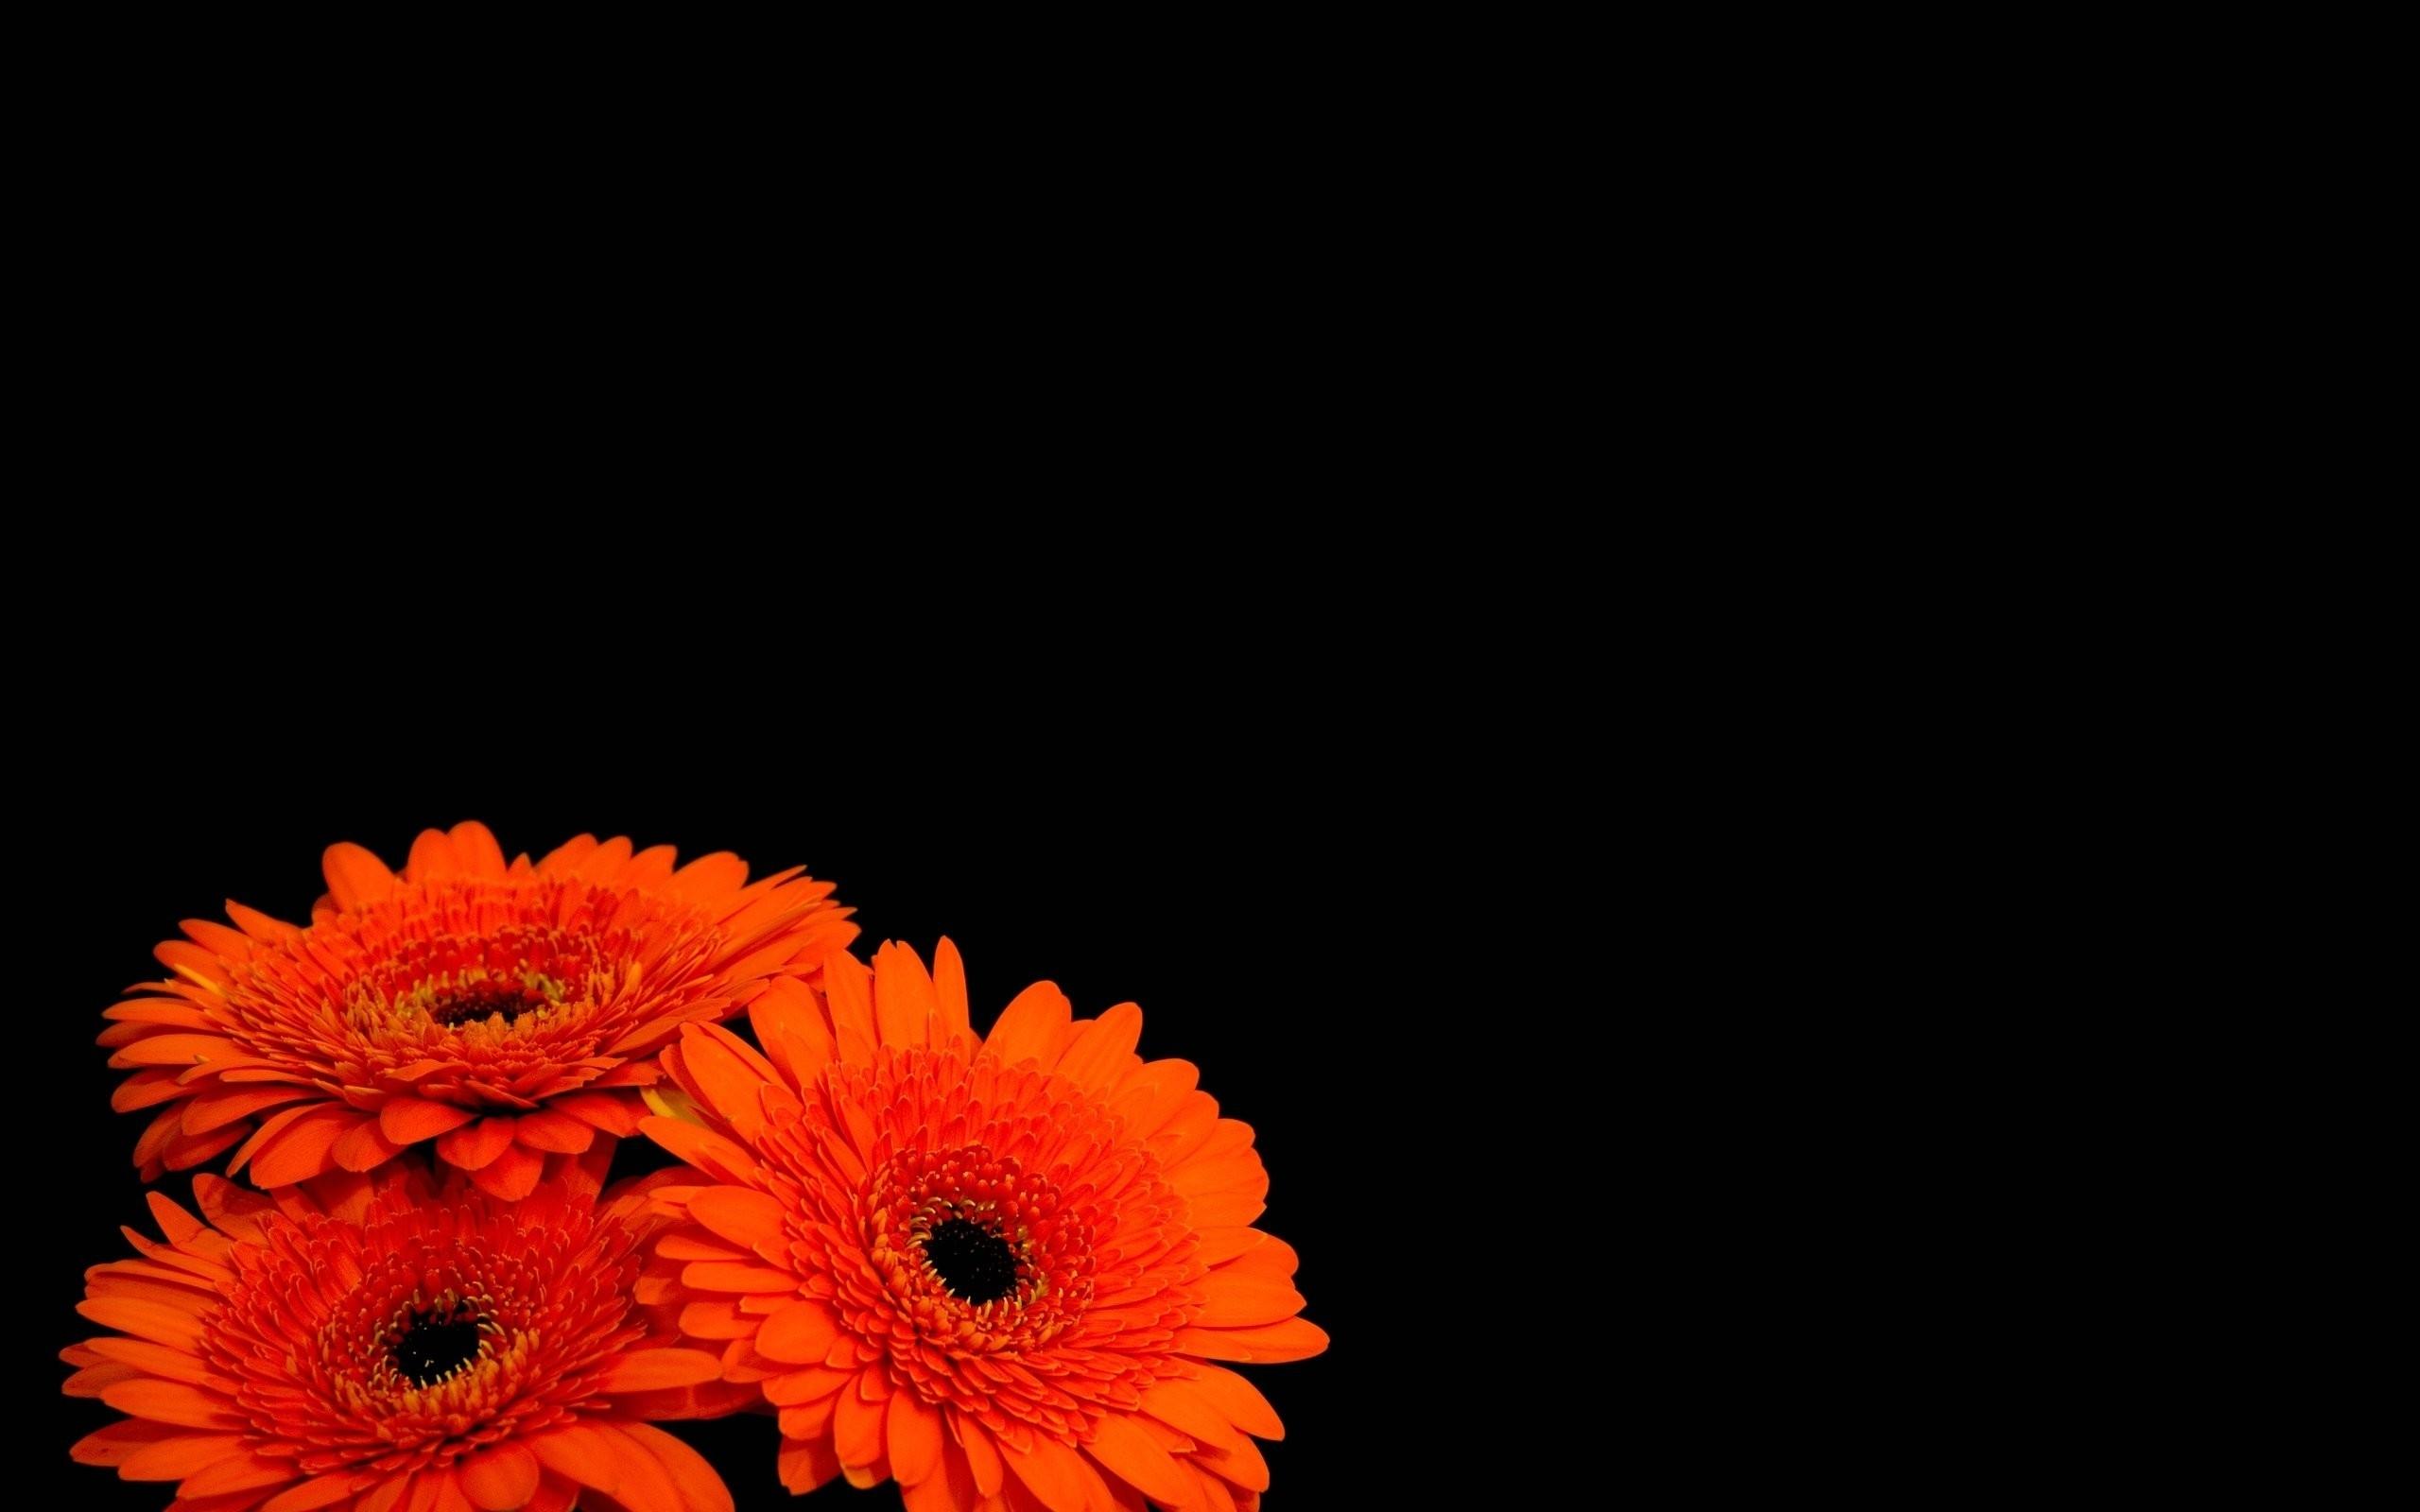 Flowers On Black Background Wallpaper Wallpapersafari